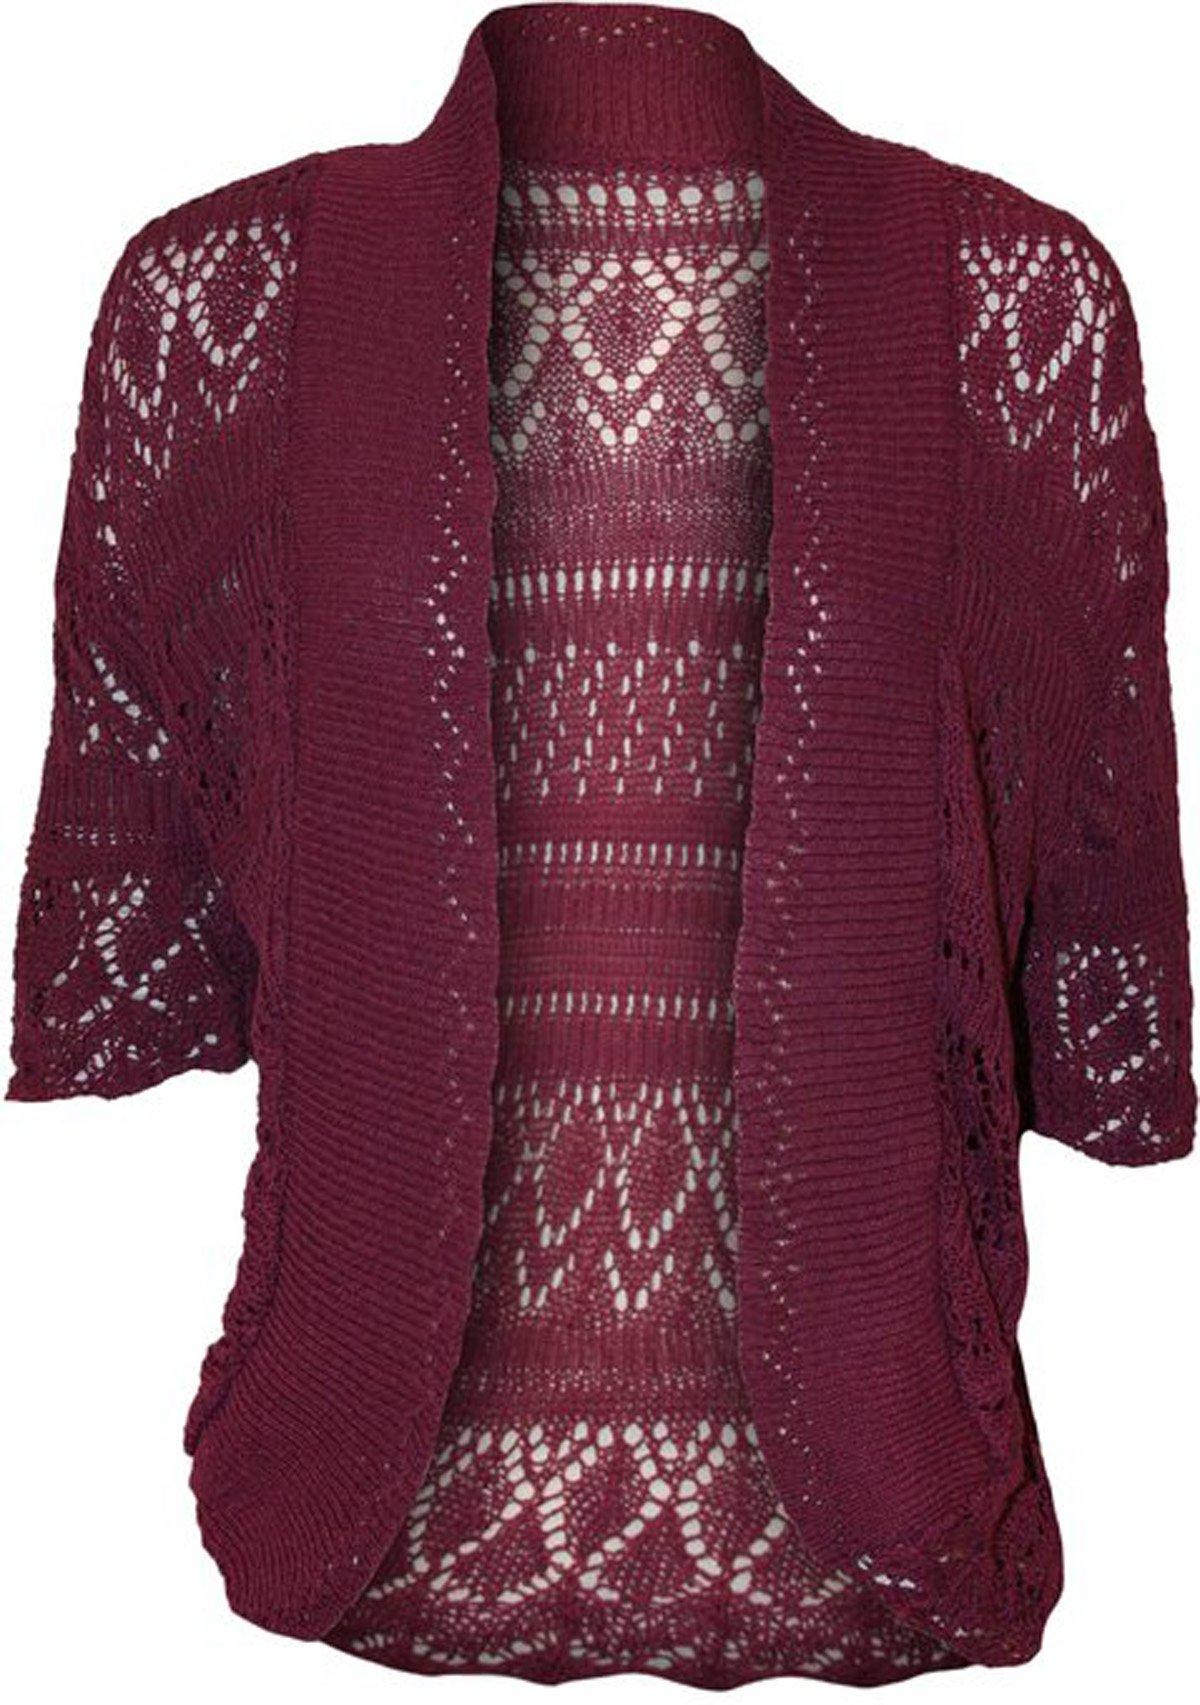 FashionMark Plus Size Women's Crochet Knitted Cardigan Shrug (Khaki Green)